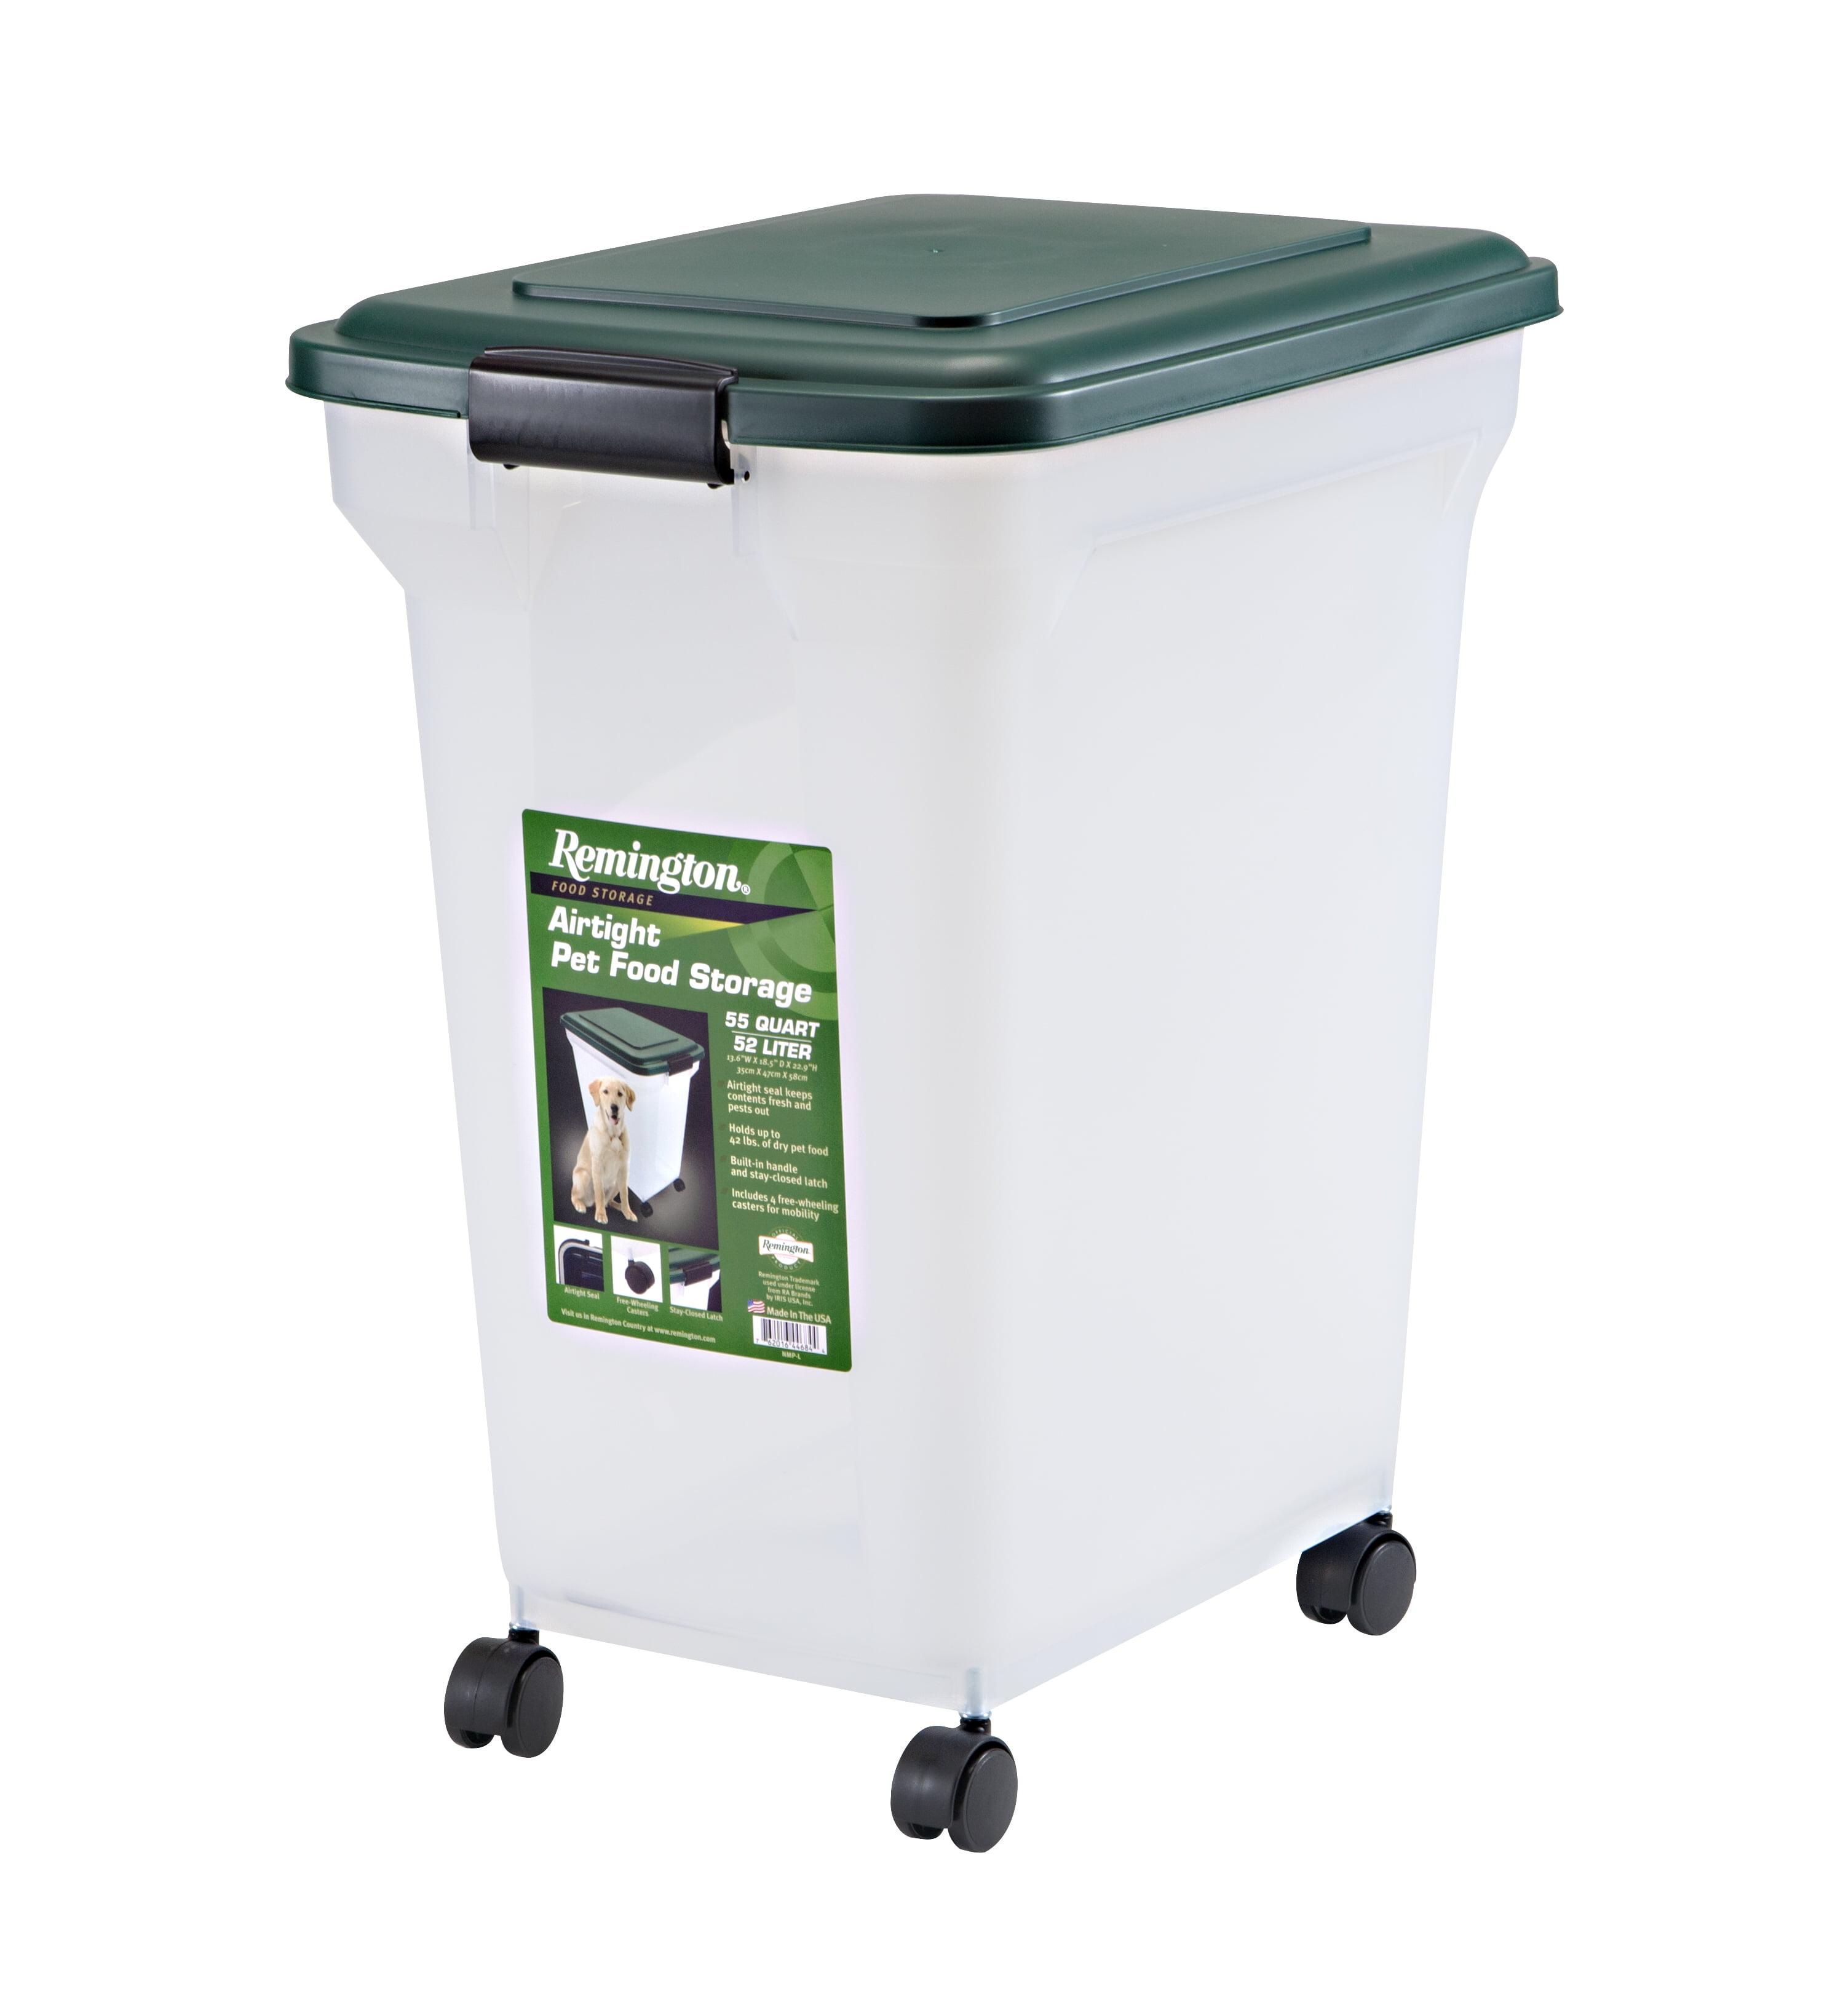 Remington Airtight Pet Food Container, 55 Qt